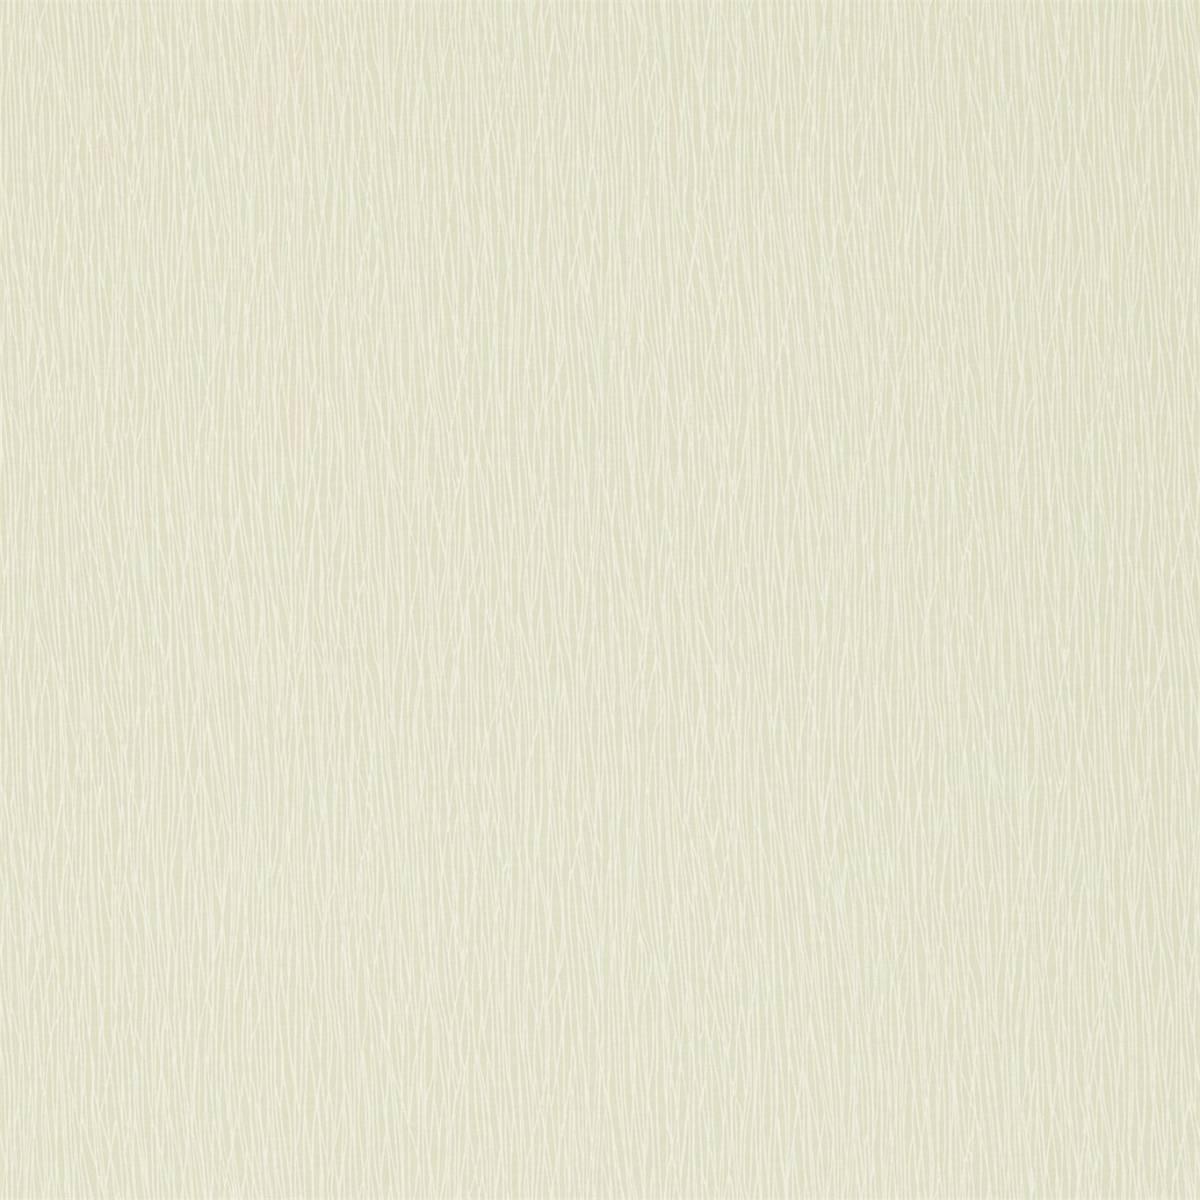 Bark Wallpaper Pebble 110870 Scion Spirit Amp Soul